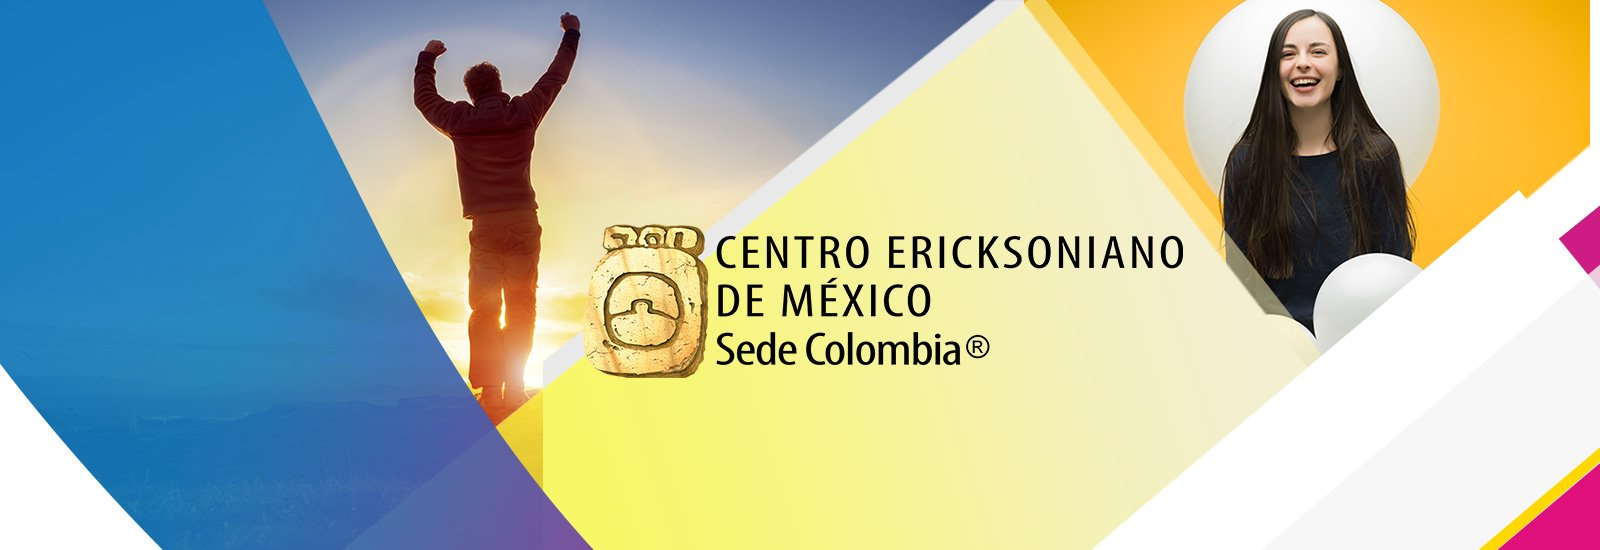 centro ericksoniano mexico sede colombia